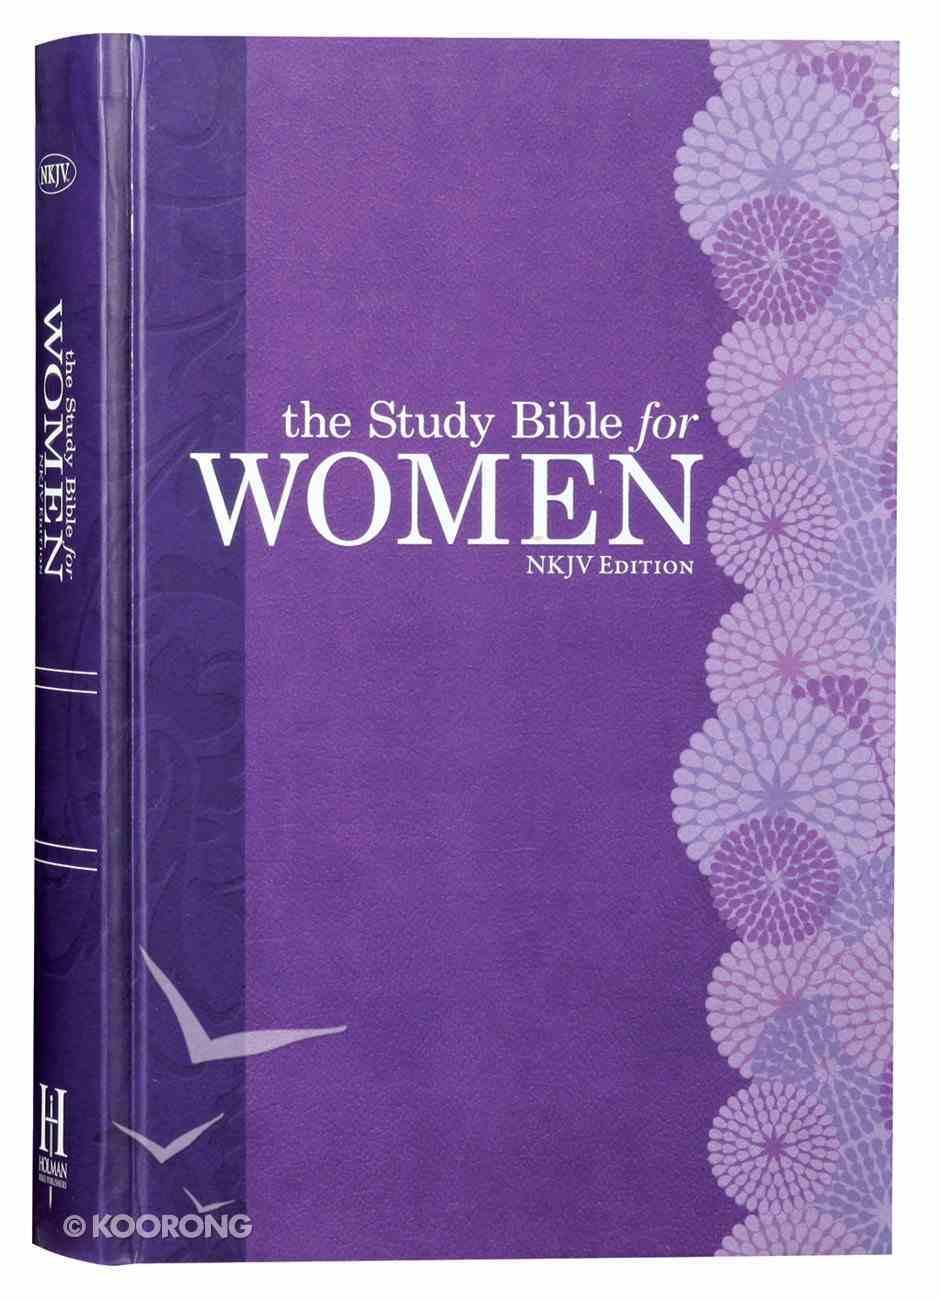 NKJV Study Bible For Women Hardback